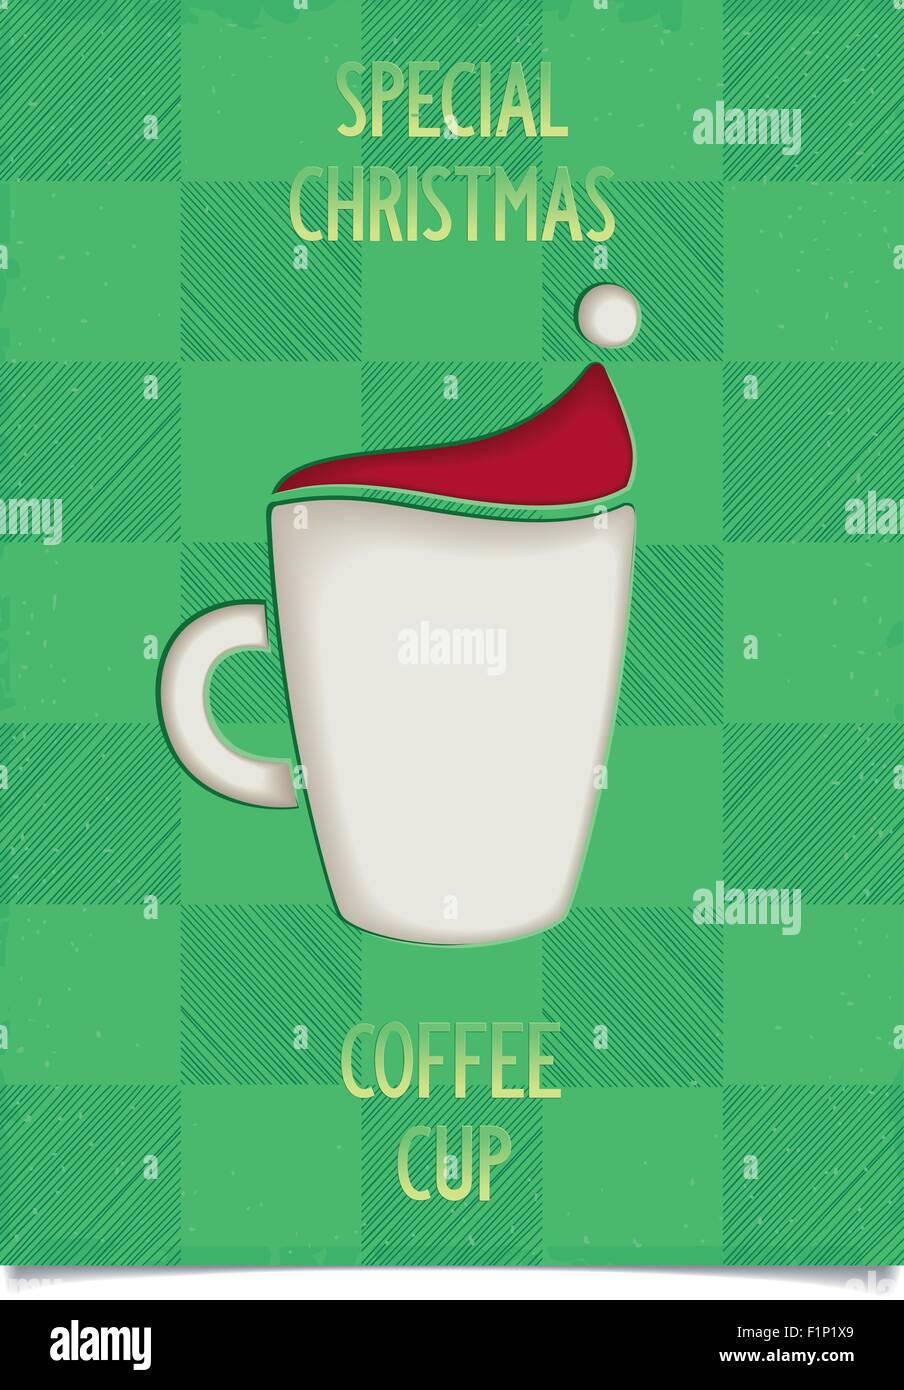 Christmas Restaurant Poster.Fun Vintage Christmas Poster Design For Restaurant And Cafe